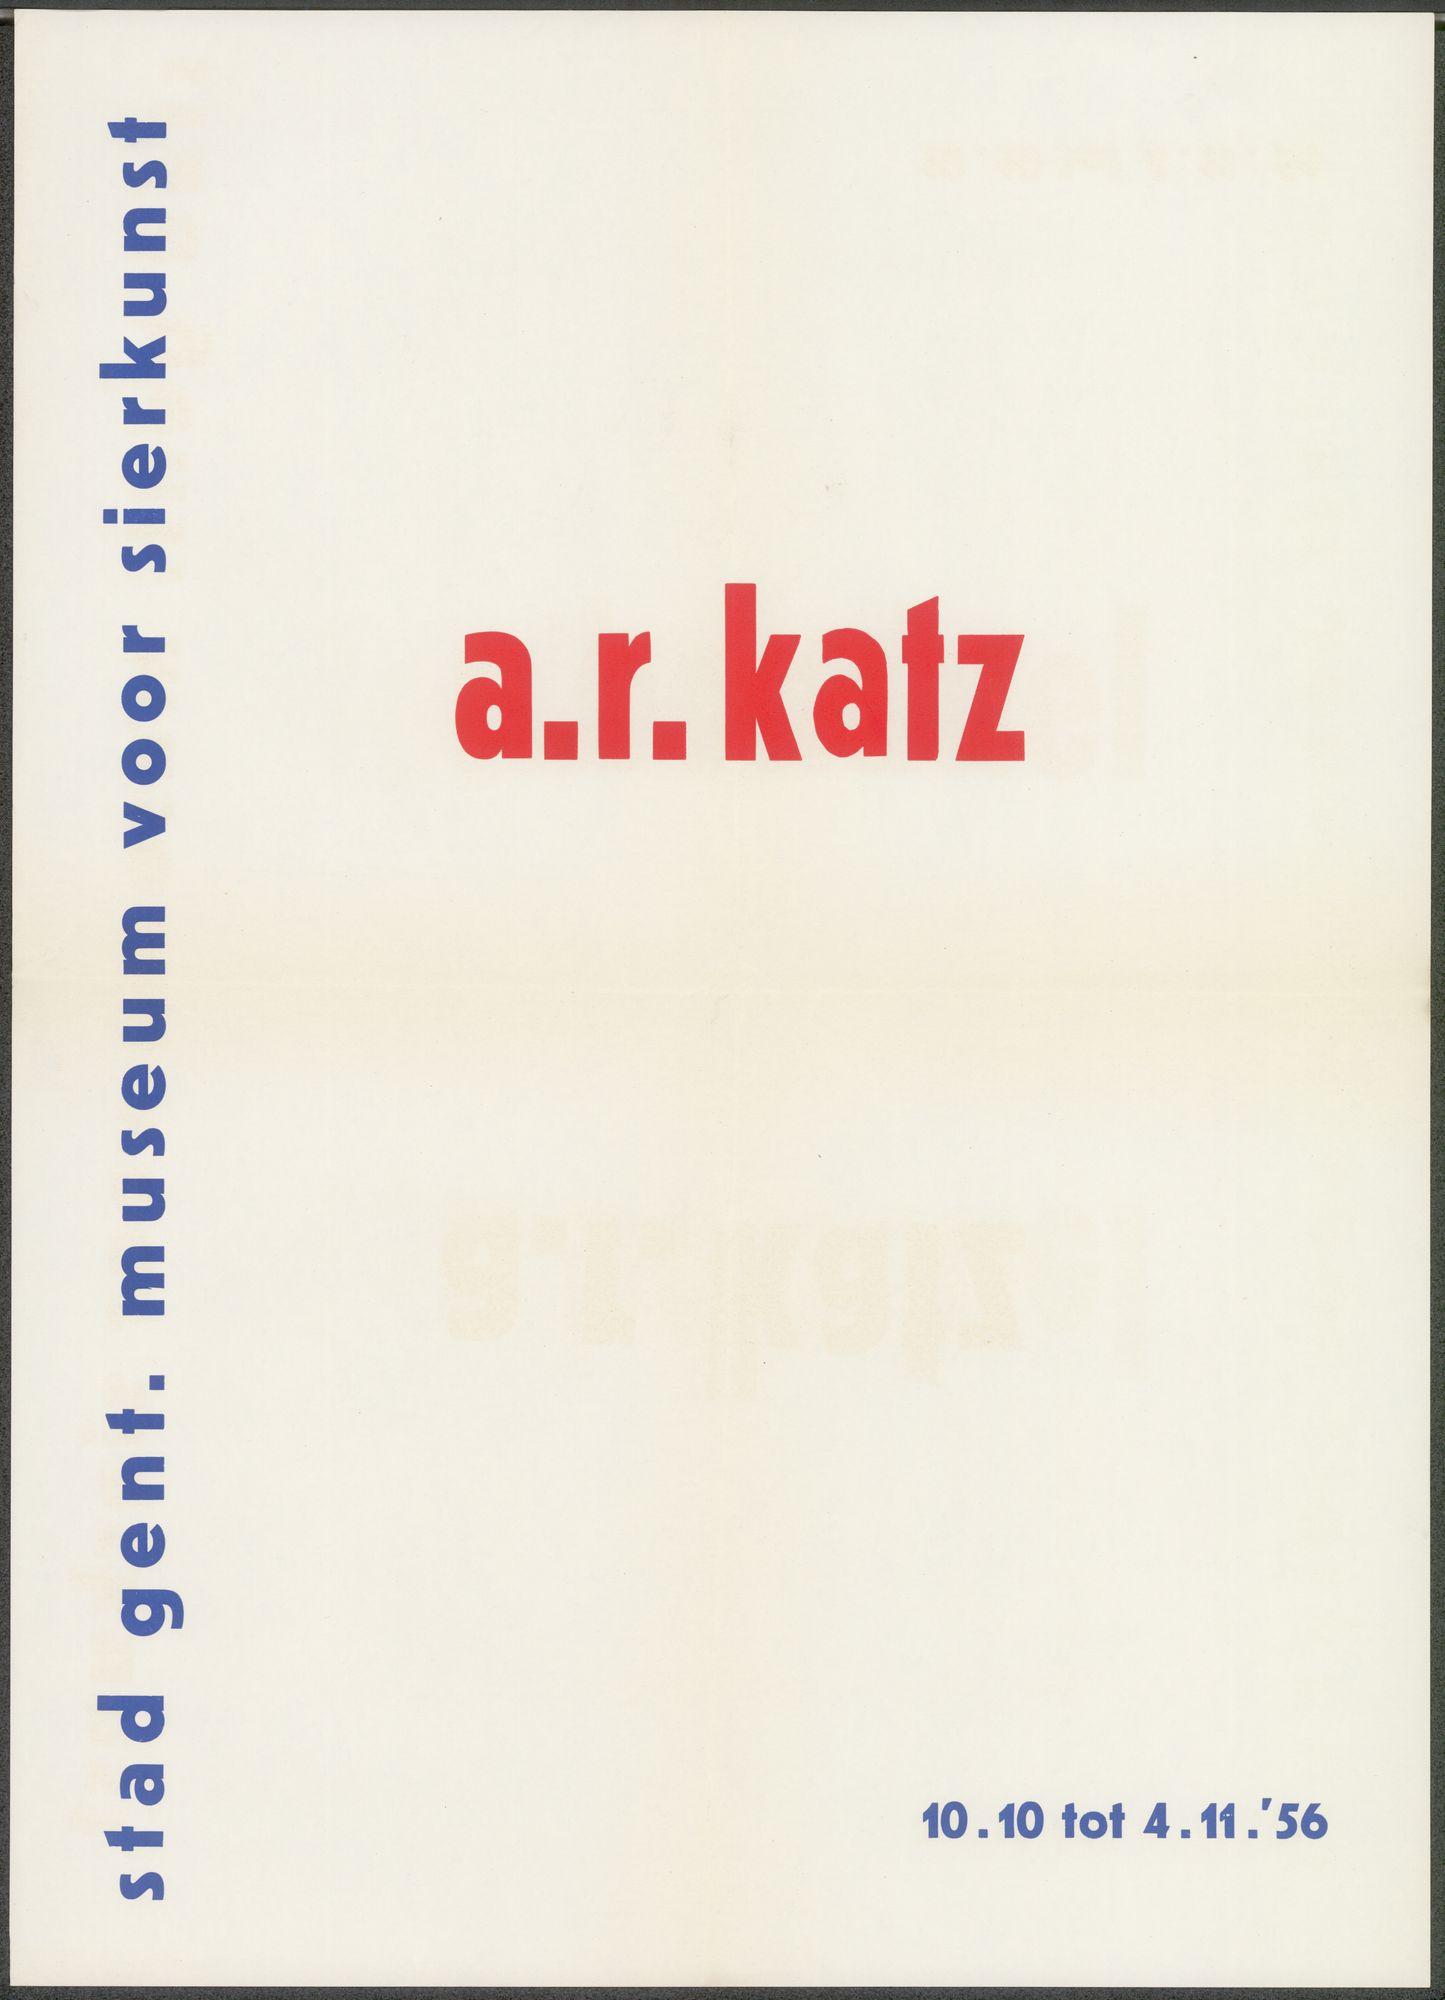 Tentoonstelling A.R. Katz, Stad Gent, Museum voor Sierkunst, Gent, 10 oktober - 4 november 1956